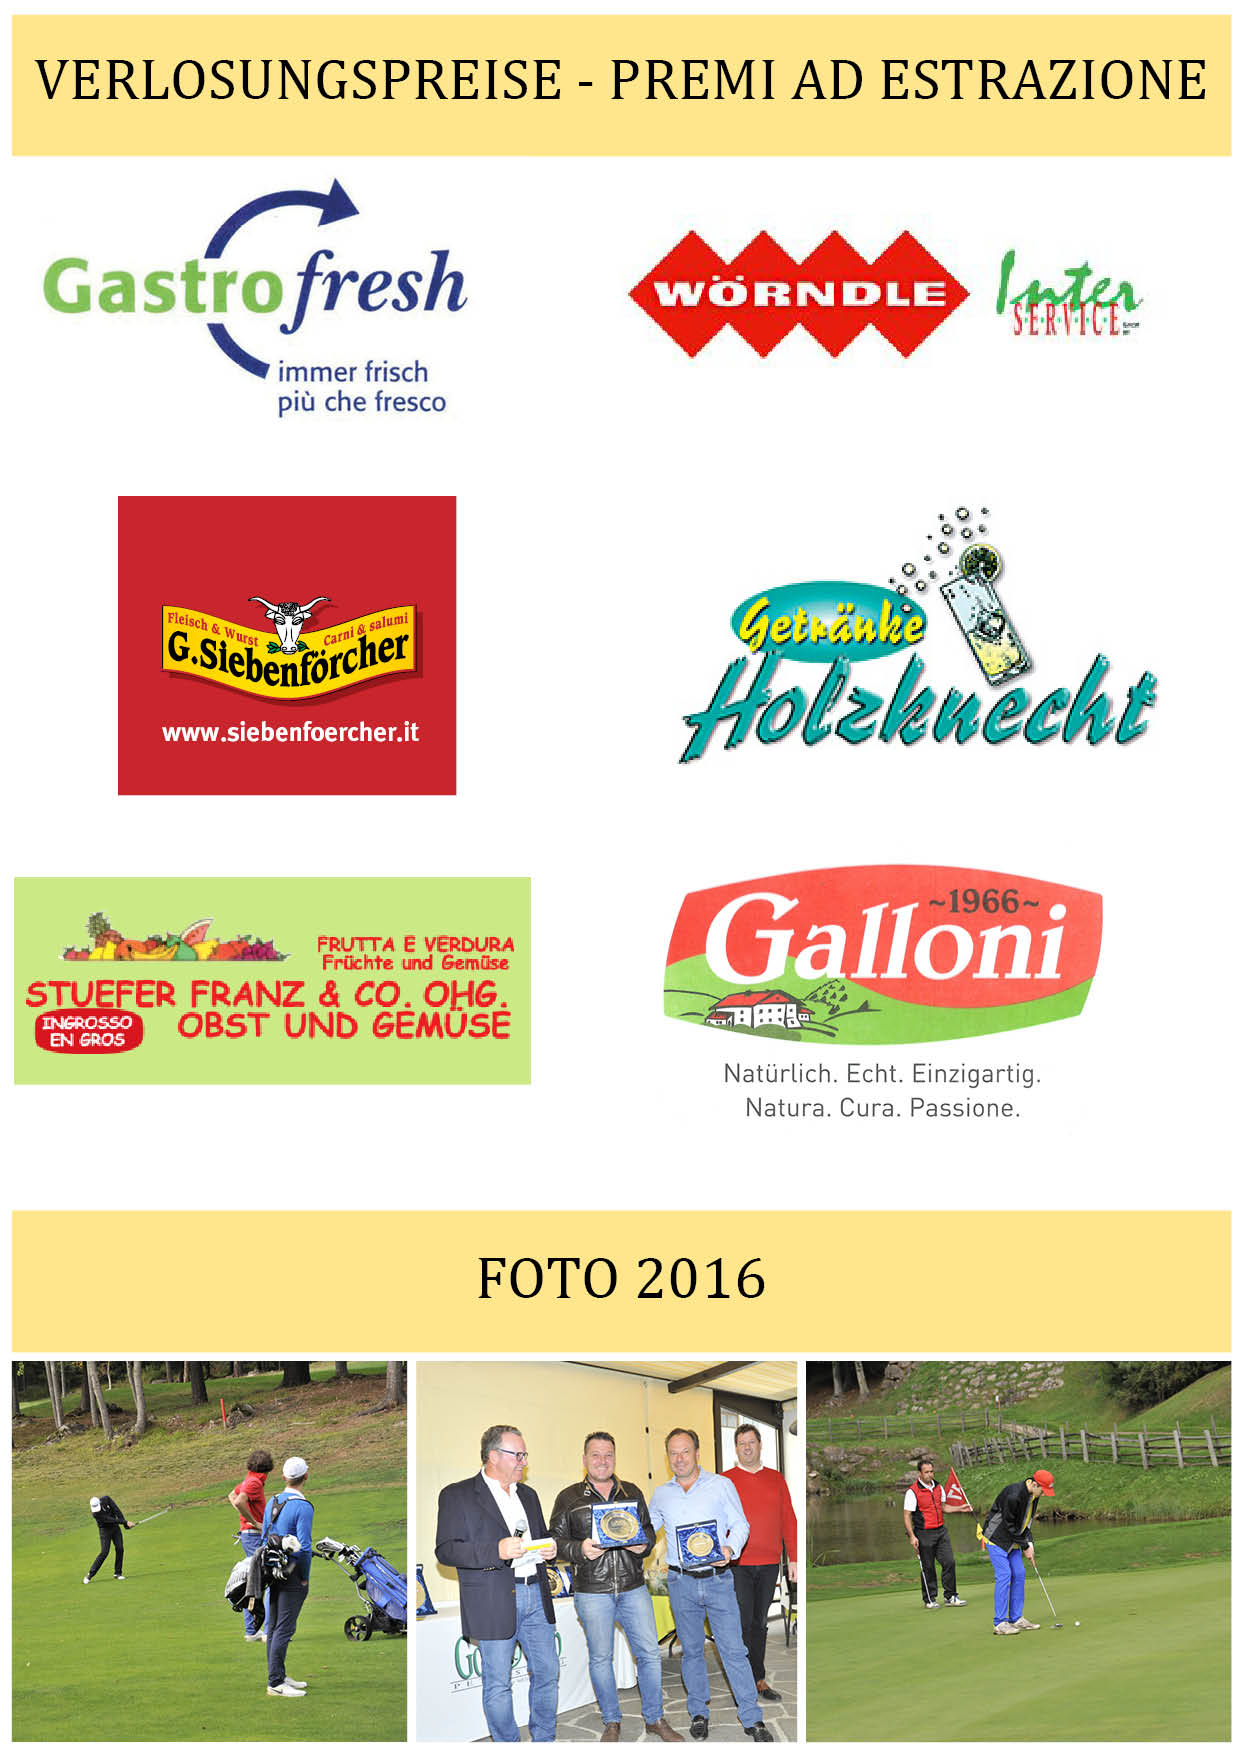 CLUBMEISTERSCHAFT - CAMPIONATO SOCIALE Clubmeisterschaft 20174 1